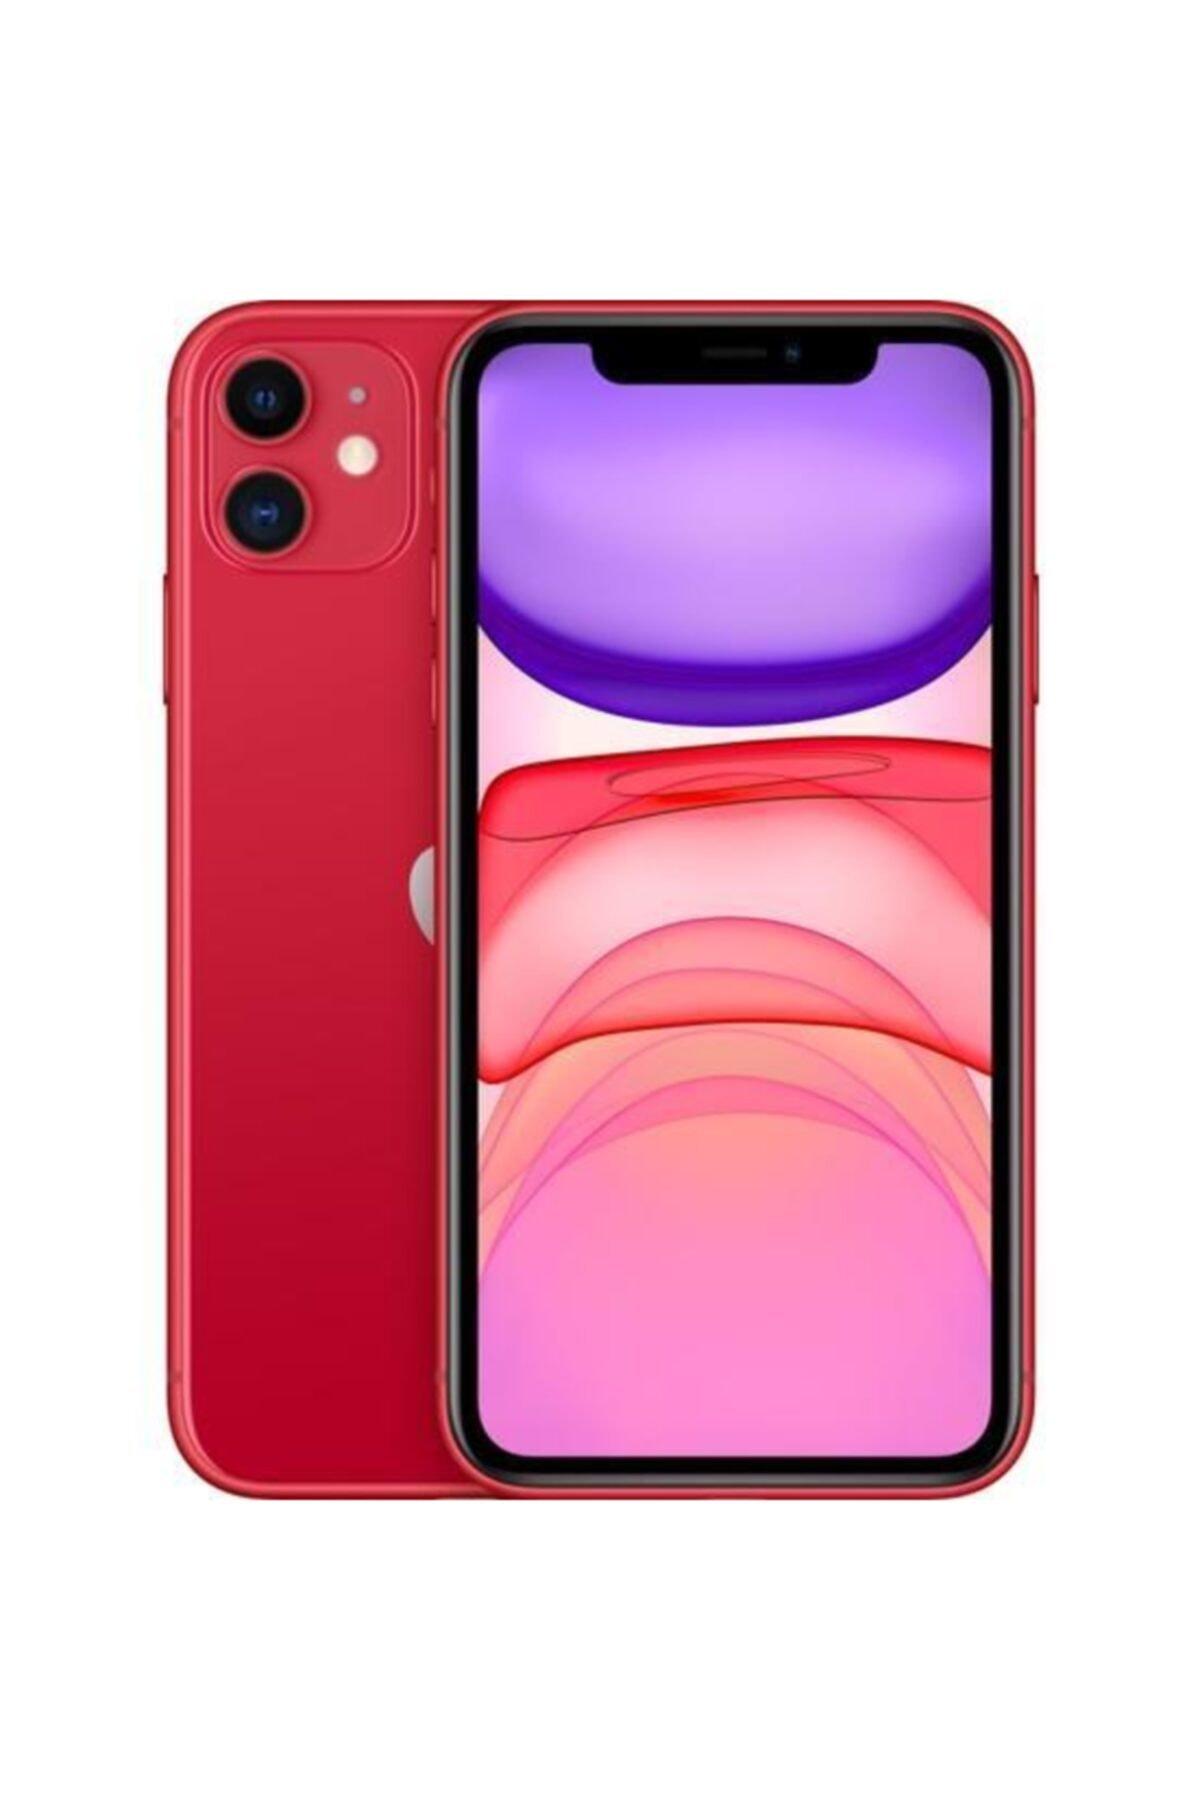 Apple iPhone 11 64GB (PRODUCT)RED Cep Telefonu (Apple Türkiye Garantili) Aksesuarlı Kutu 1